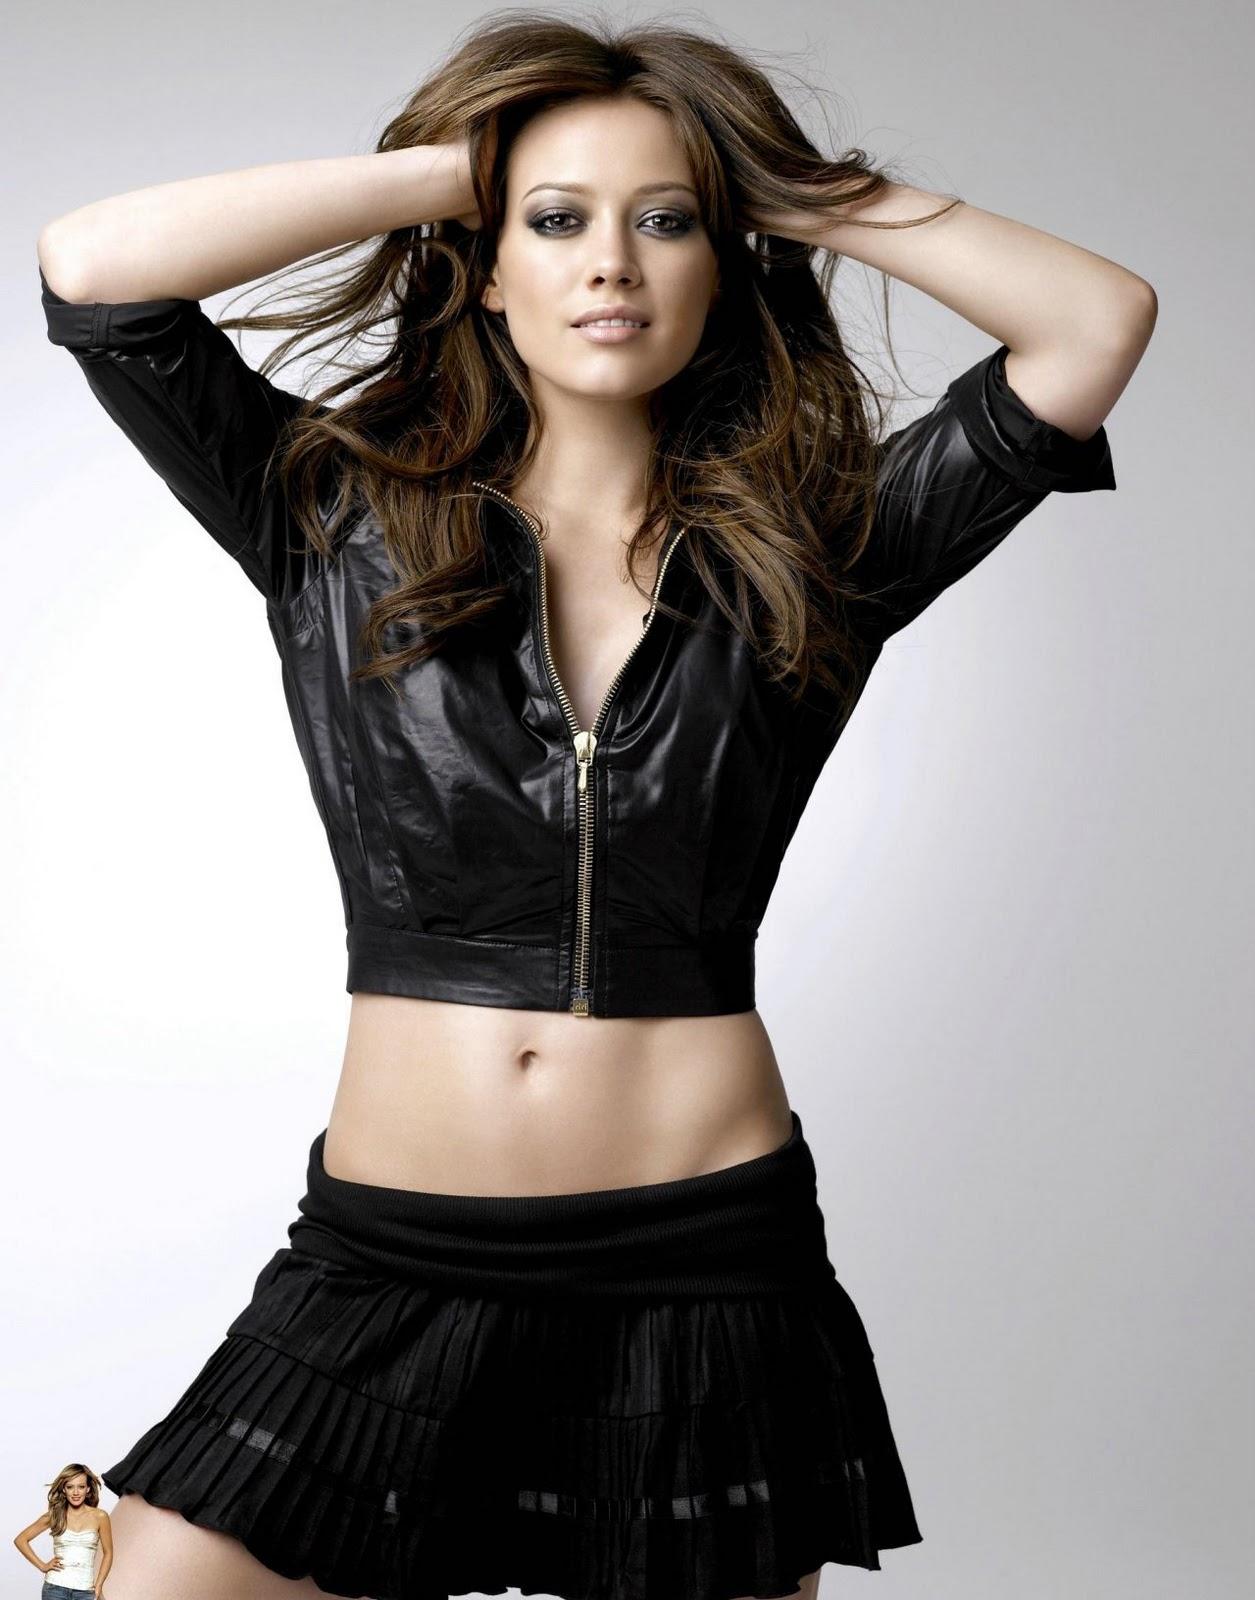 http://2.bp.blogspot.com/-ezcmwxXcRi8/Tu49KrtMQ8I/AAAAAAAABFY/vXw5Eq7dSHs/s1600/I+love+HilaryDufff.jpg